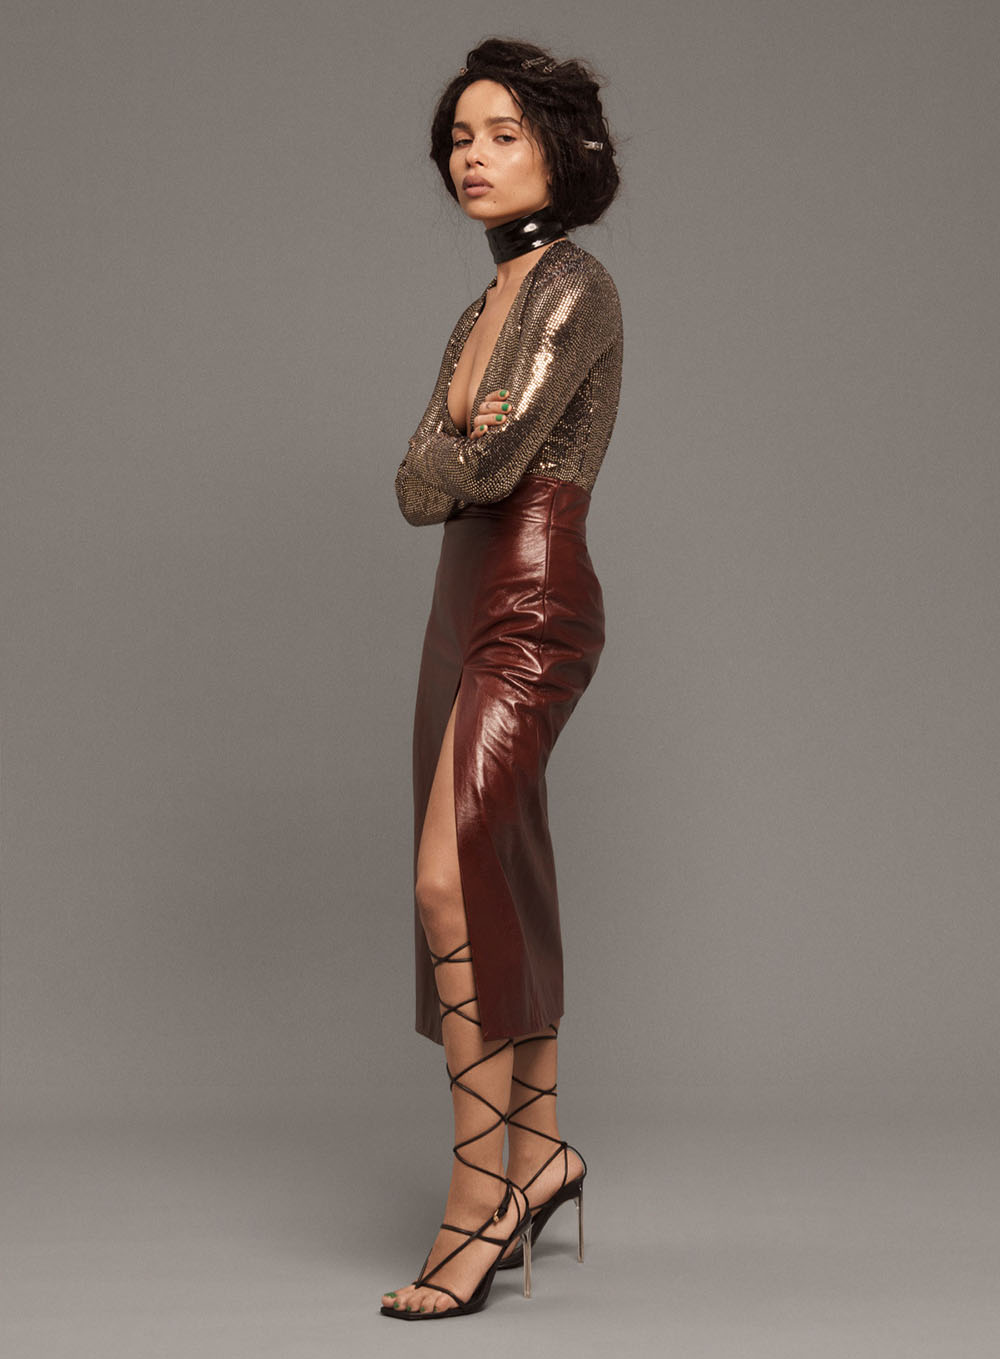 Zoë Kravitz covers Elle US February 2020 by Paola Kudacki